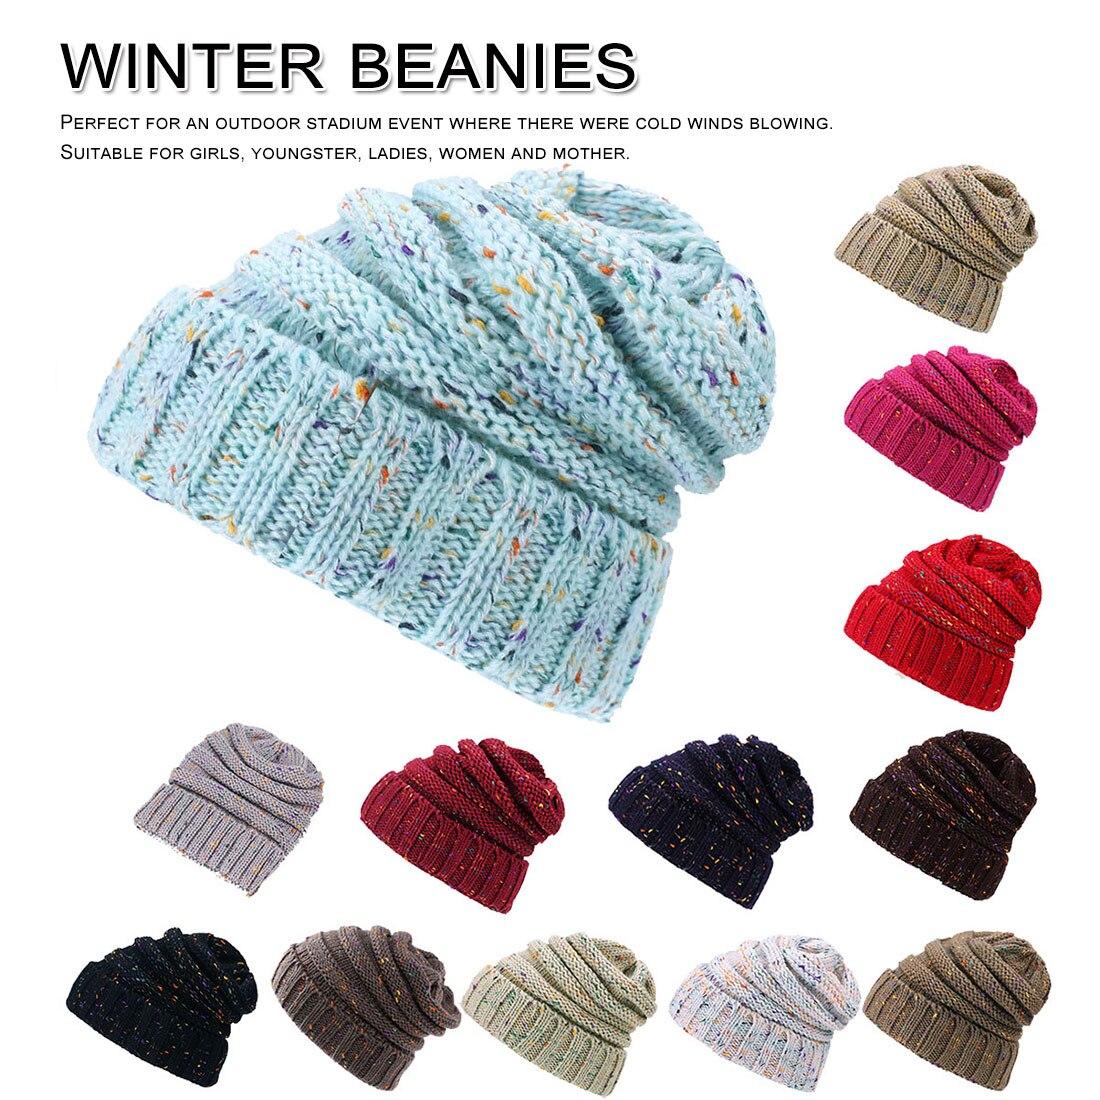 Women Ladies Winter Solid Knitting Hat Warm Cap Pile Ski HOT Sales women hat winter warm Knitted WomenS Beanies